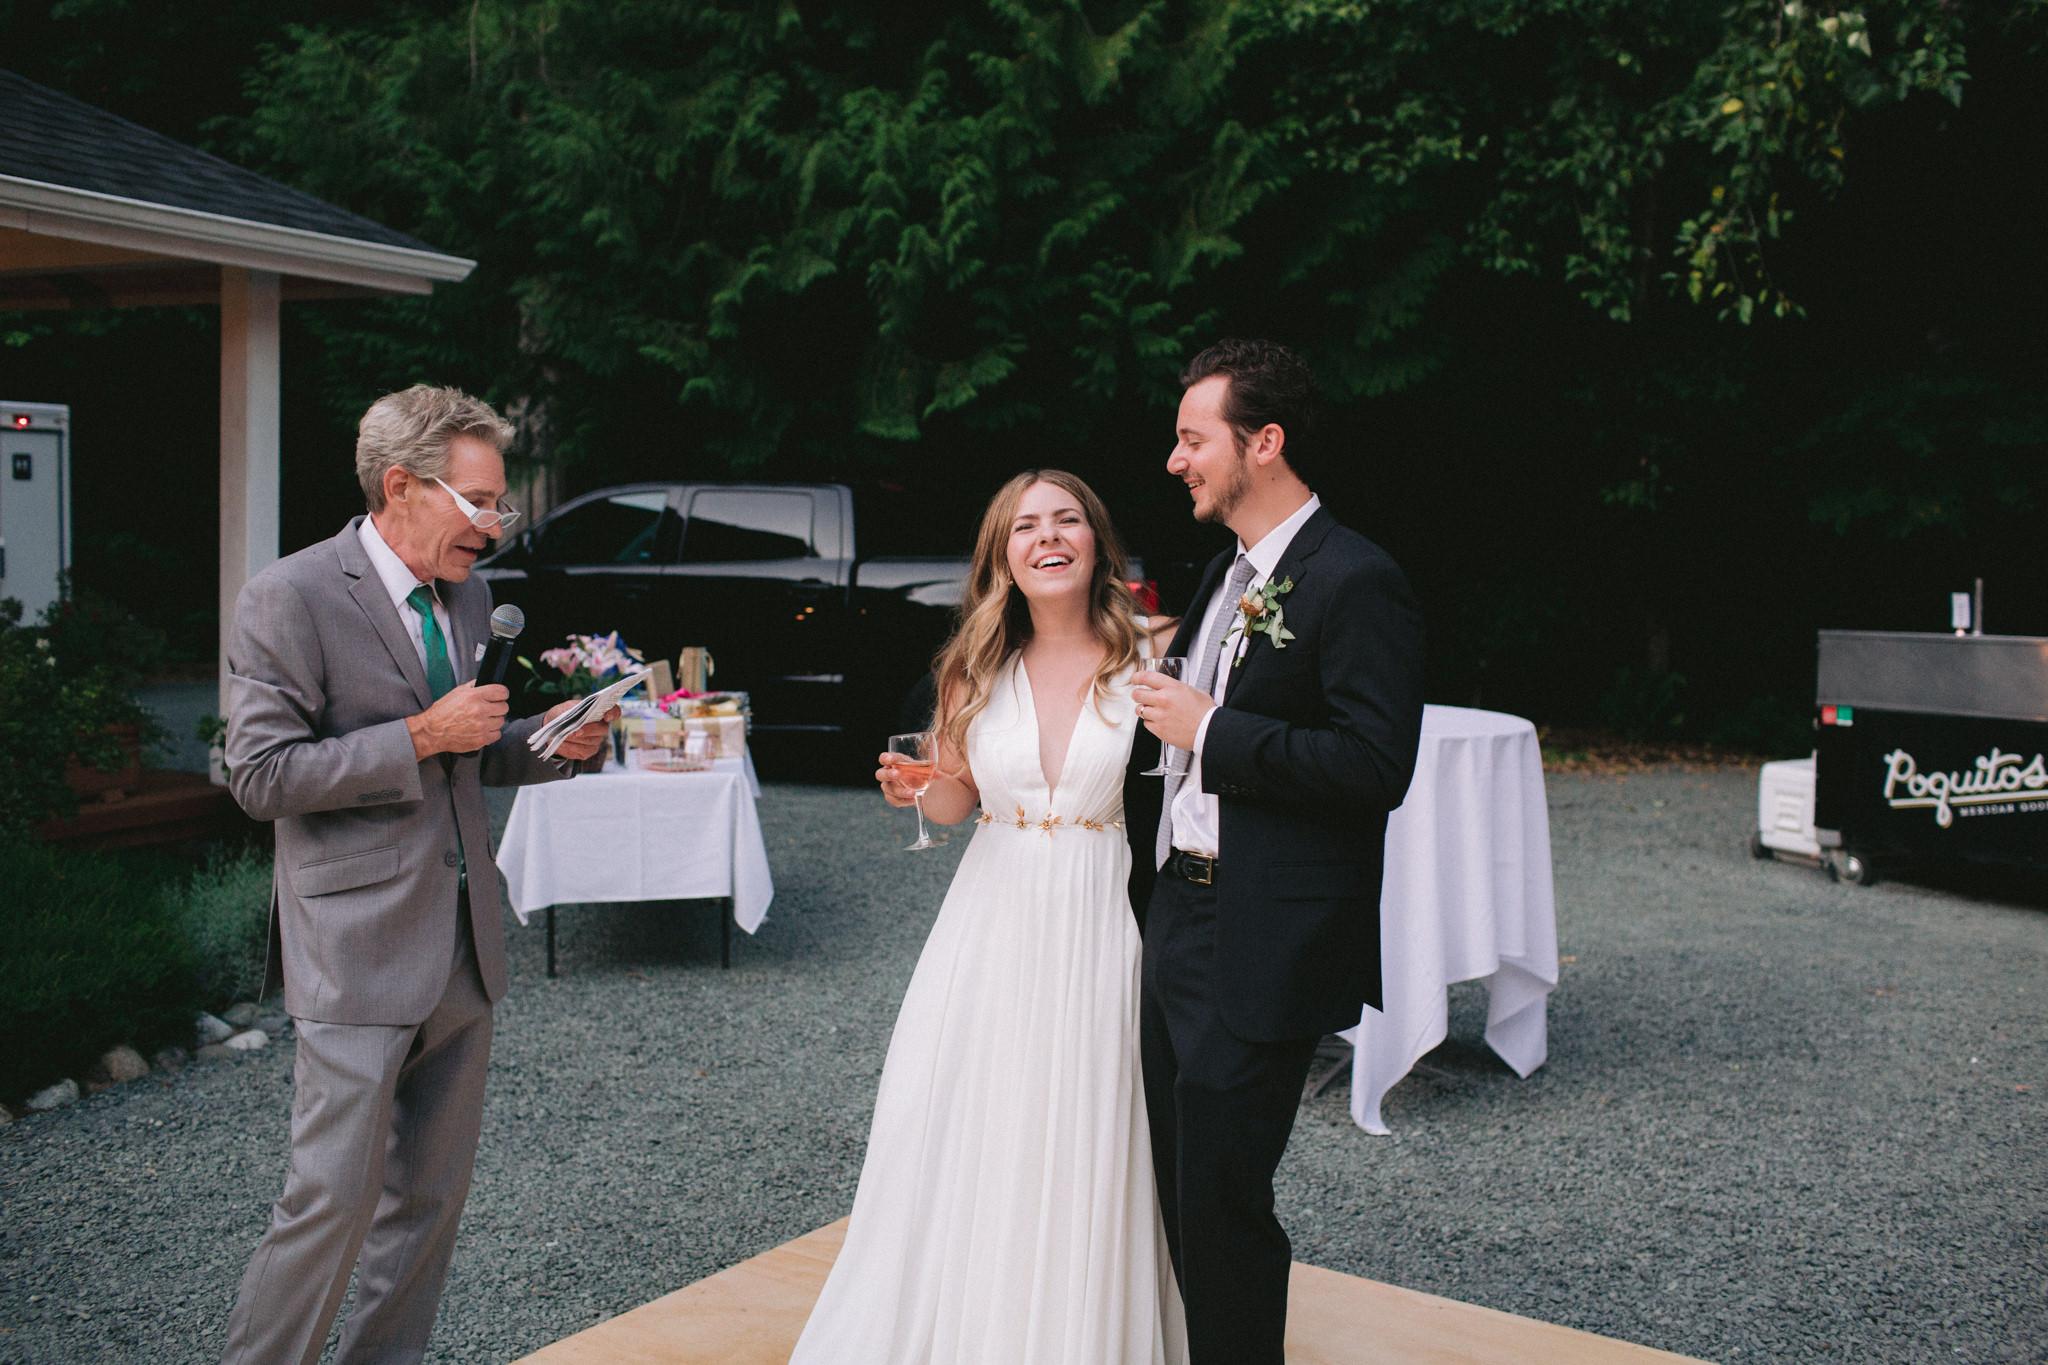 Backyard-Bainbridge-Island-Wedding-Alycia-Lovell-Photography-207.JPG